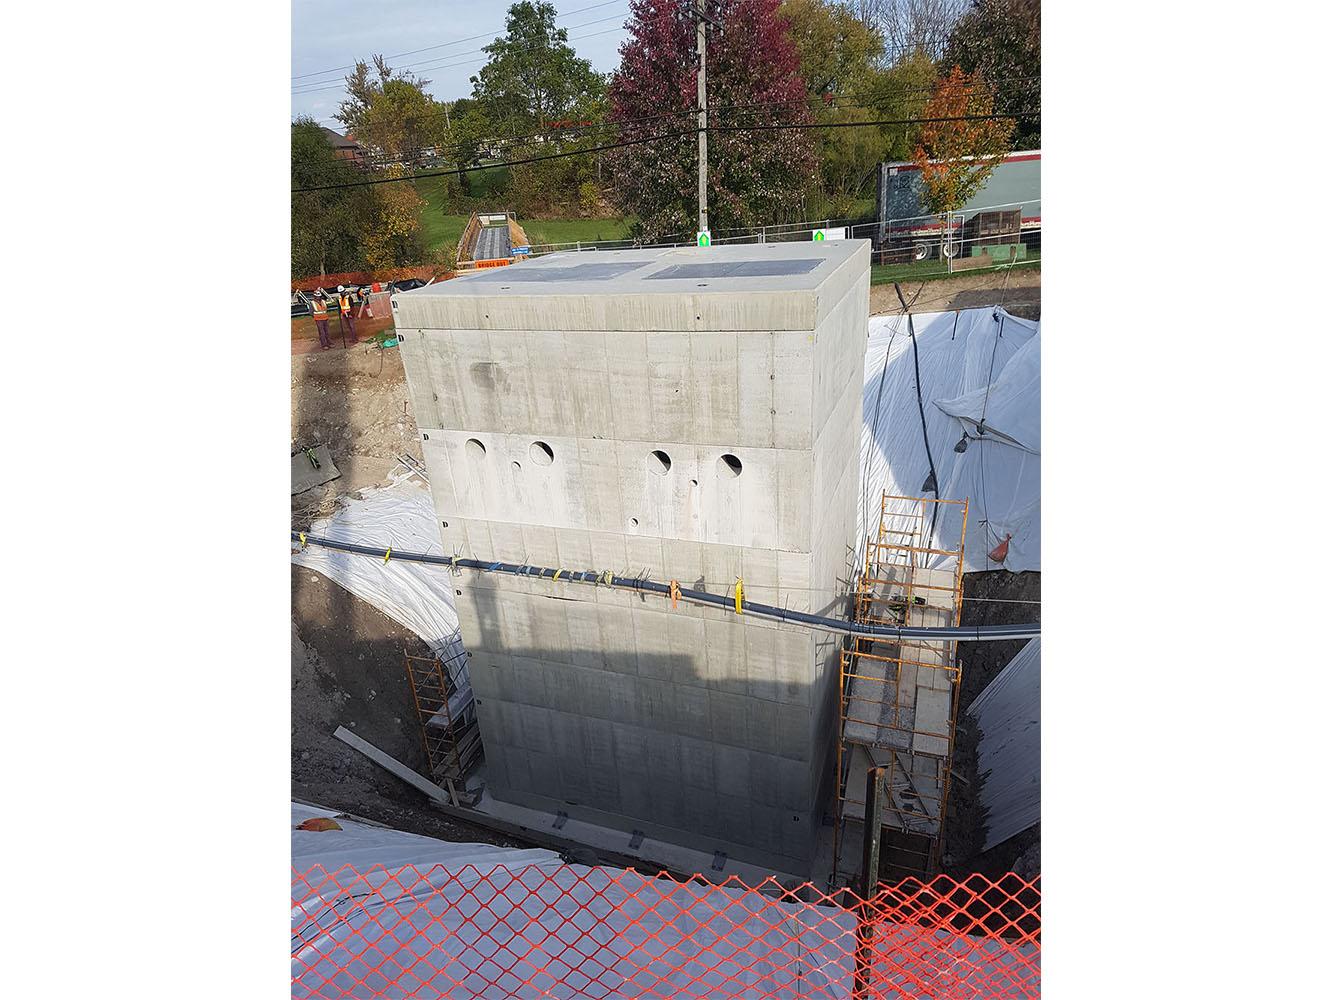 William Street Superload Chamber Pump Station